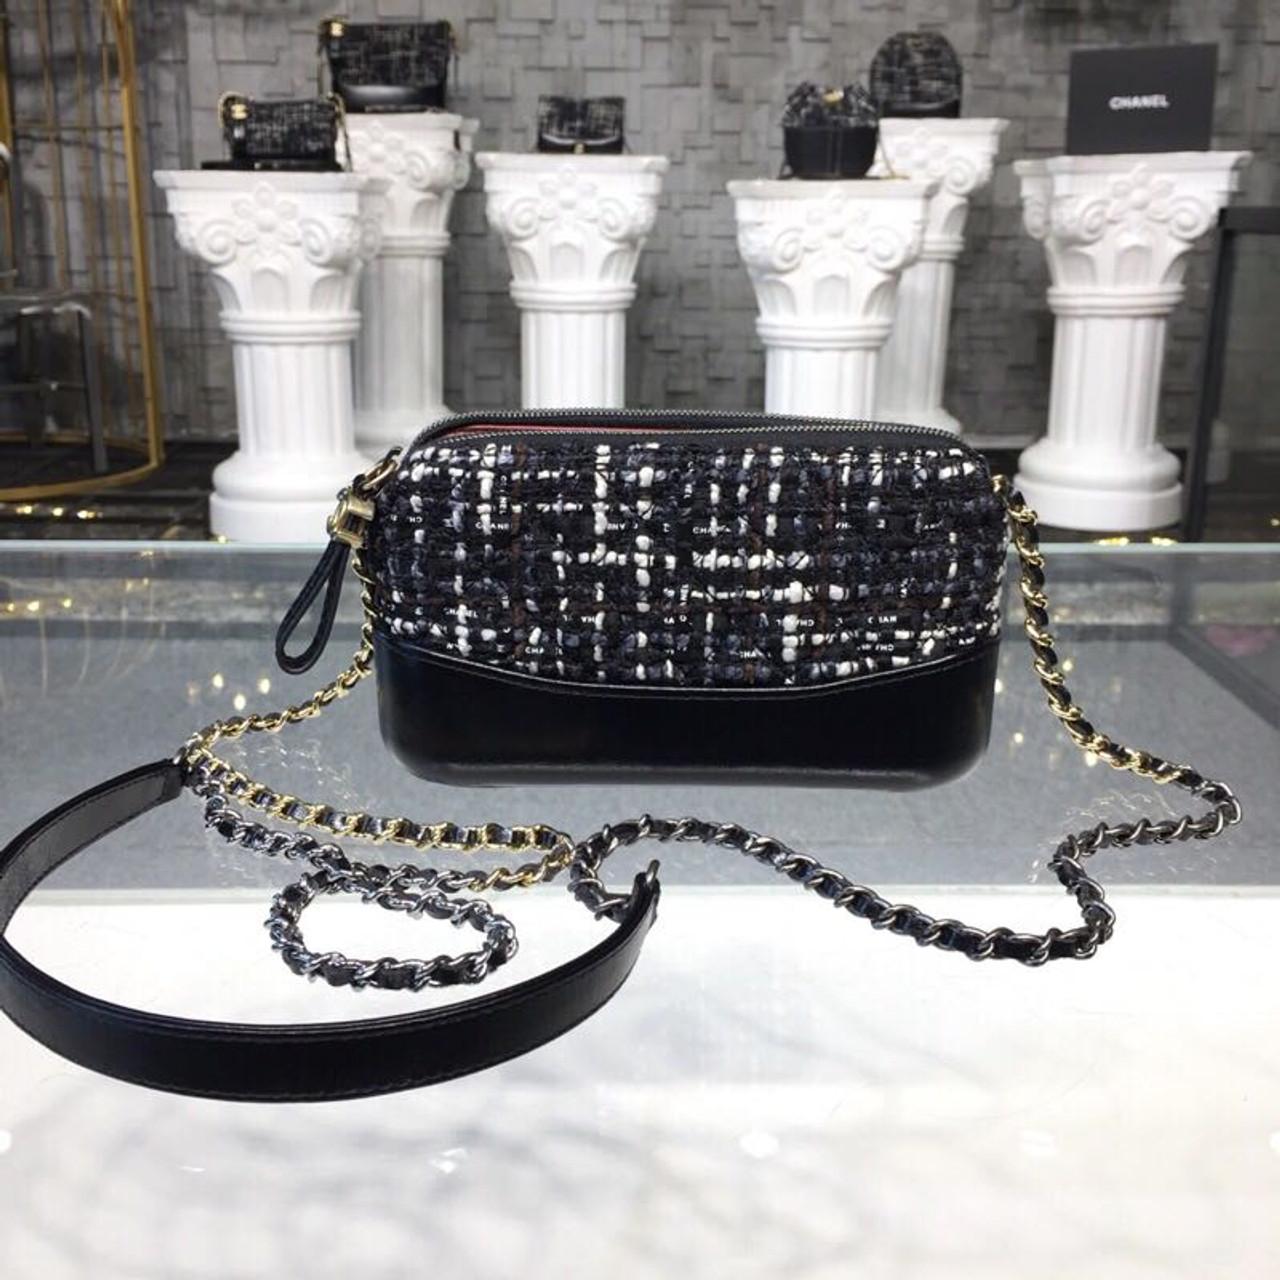 827fd38e619d2e Chanel Gabrielle Mini Hobo Bag 18cm Gold Hardware Tweed/Lambskin Leather  Fall/Winter Act